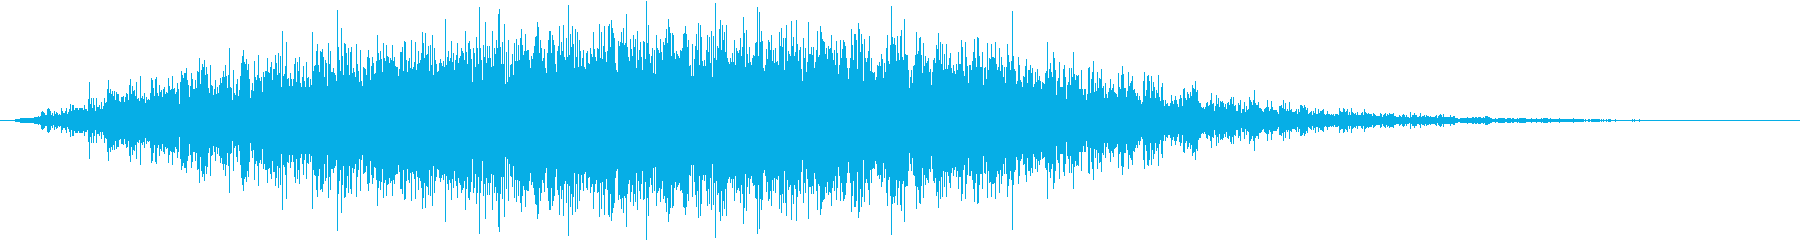 SpecialFx EC07_95_4の再生済みの波形